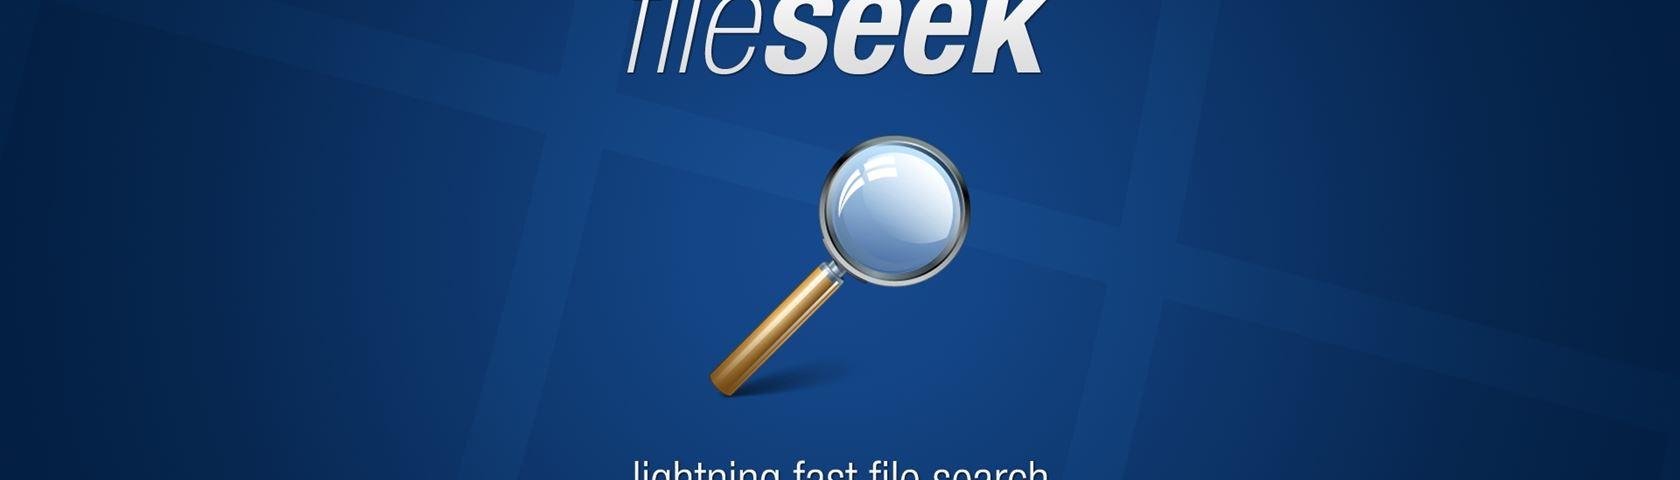 FileSeek by Binary Fortress Software